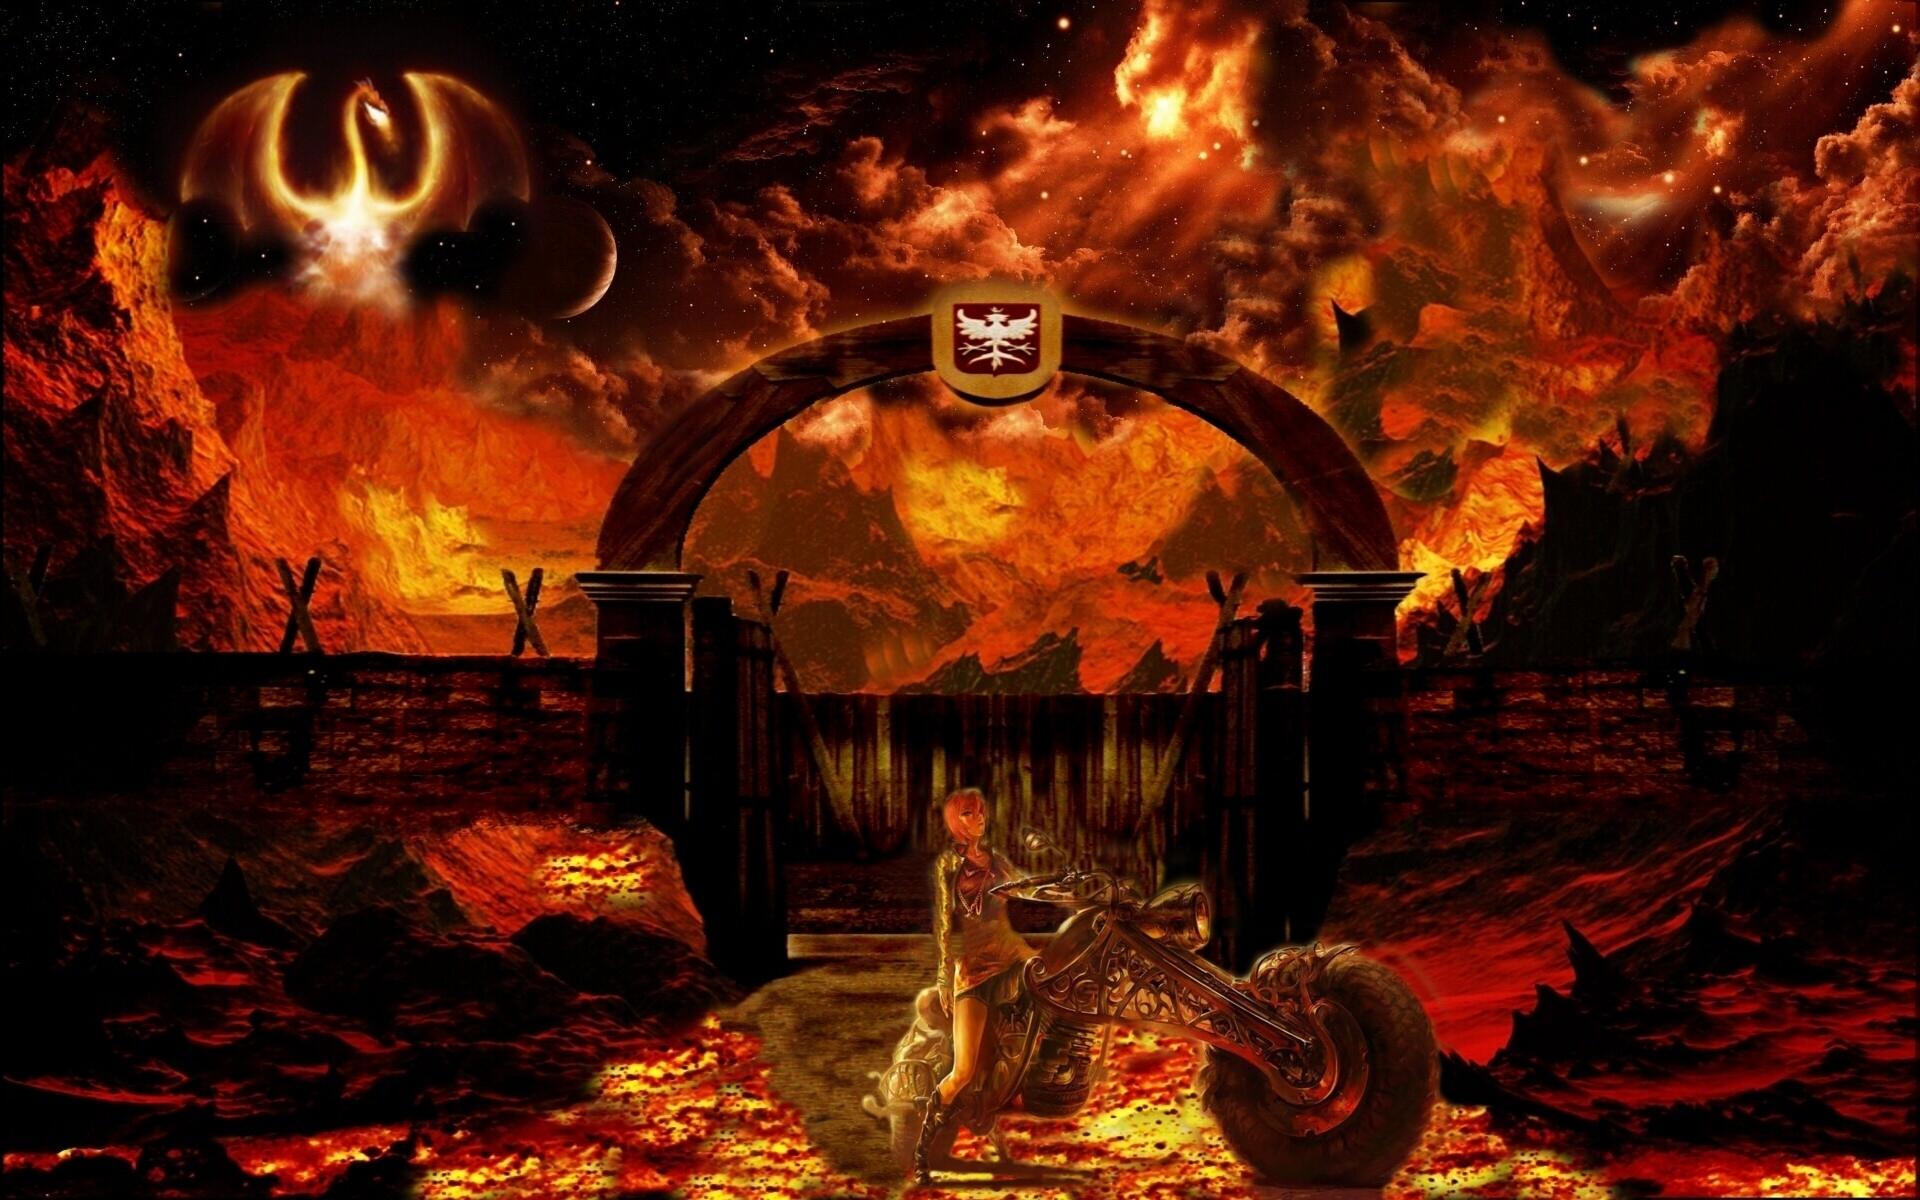 High Resolution Wallpaper | Hell Rider 1920x1200 px